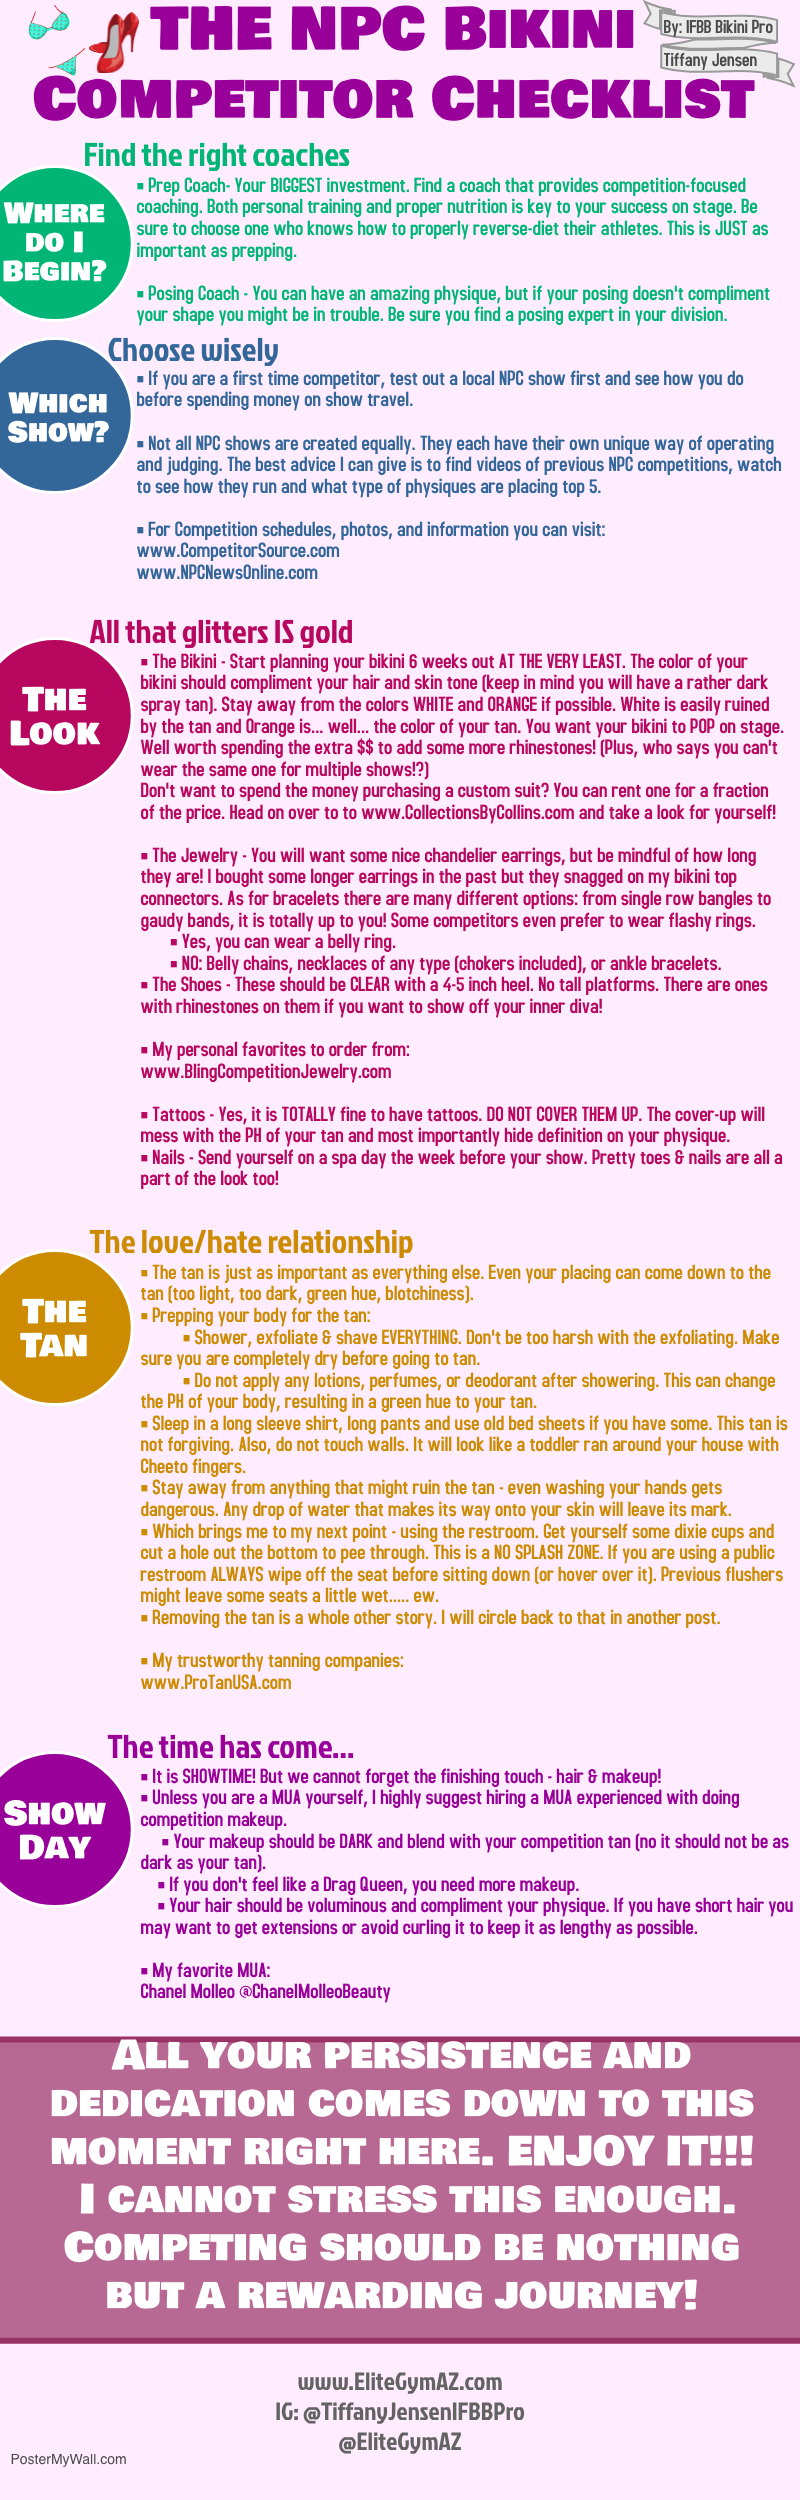 The NPC Bikini Competitor Checklist - Made with PosterMyWall (1).jpg